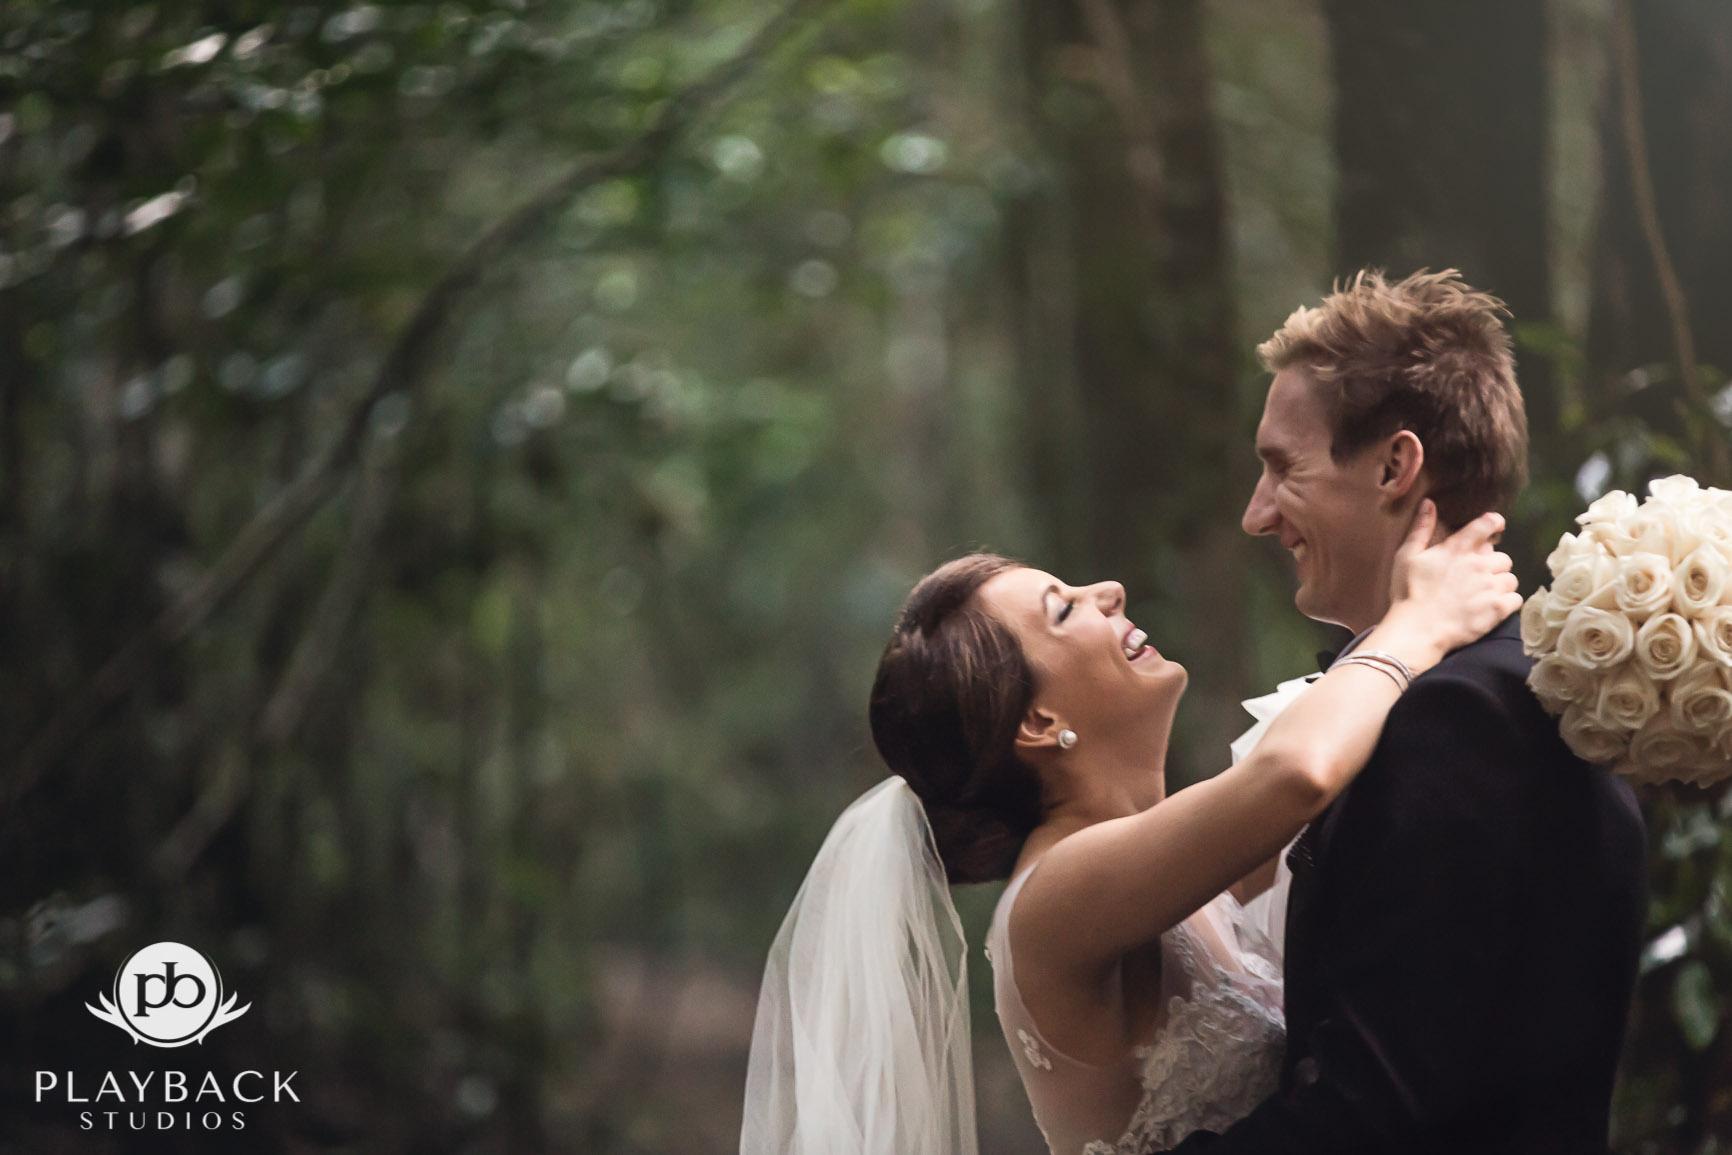 Sunshine_Coast_Noosa_Wedding_Photography_Playback_Studios_Anita_Peter-4.jpg